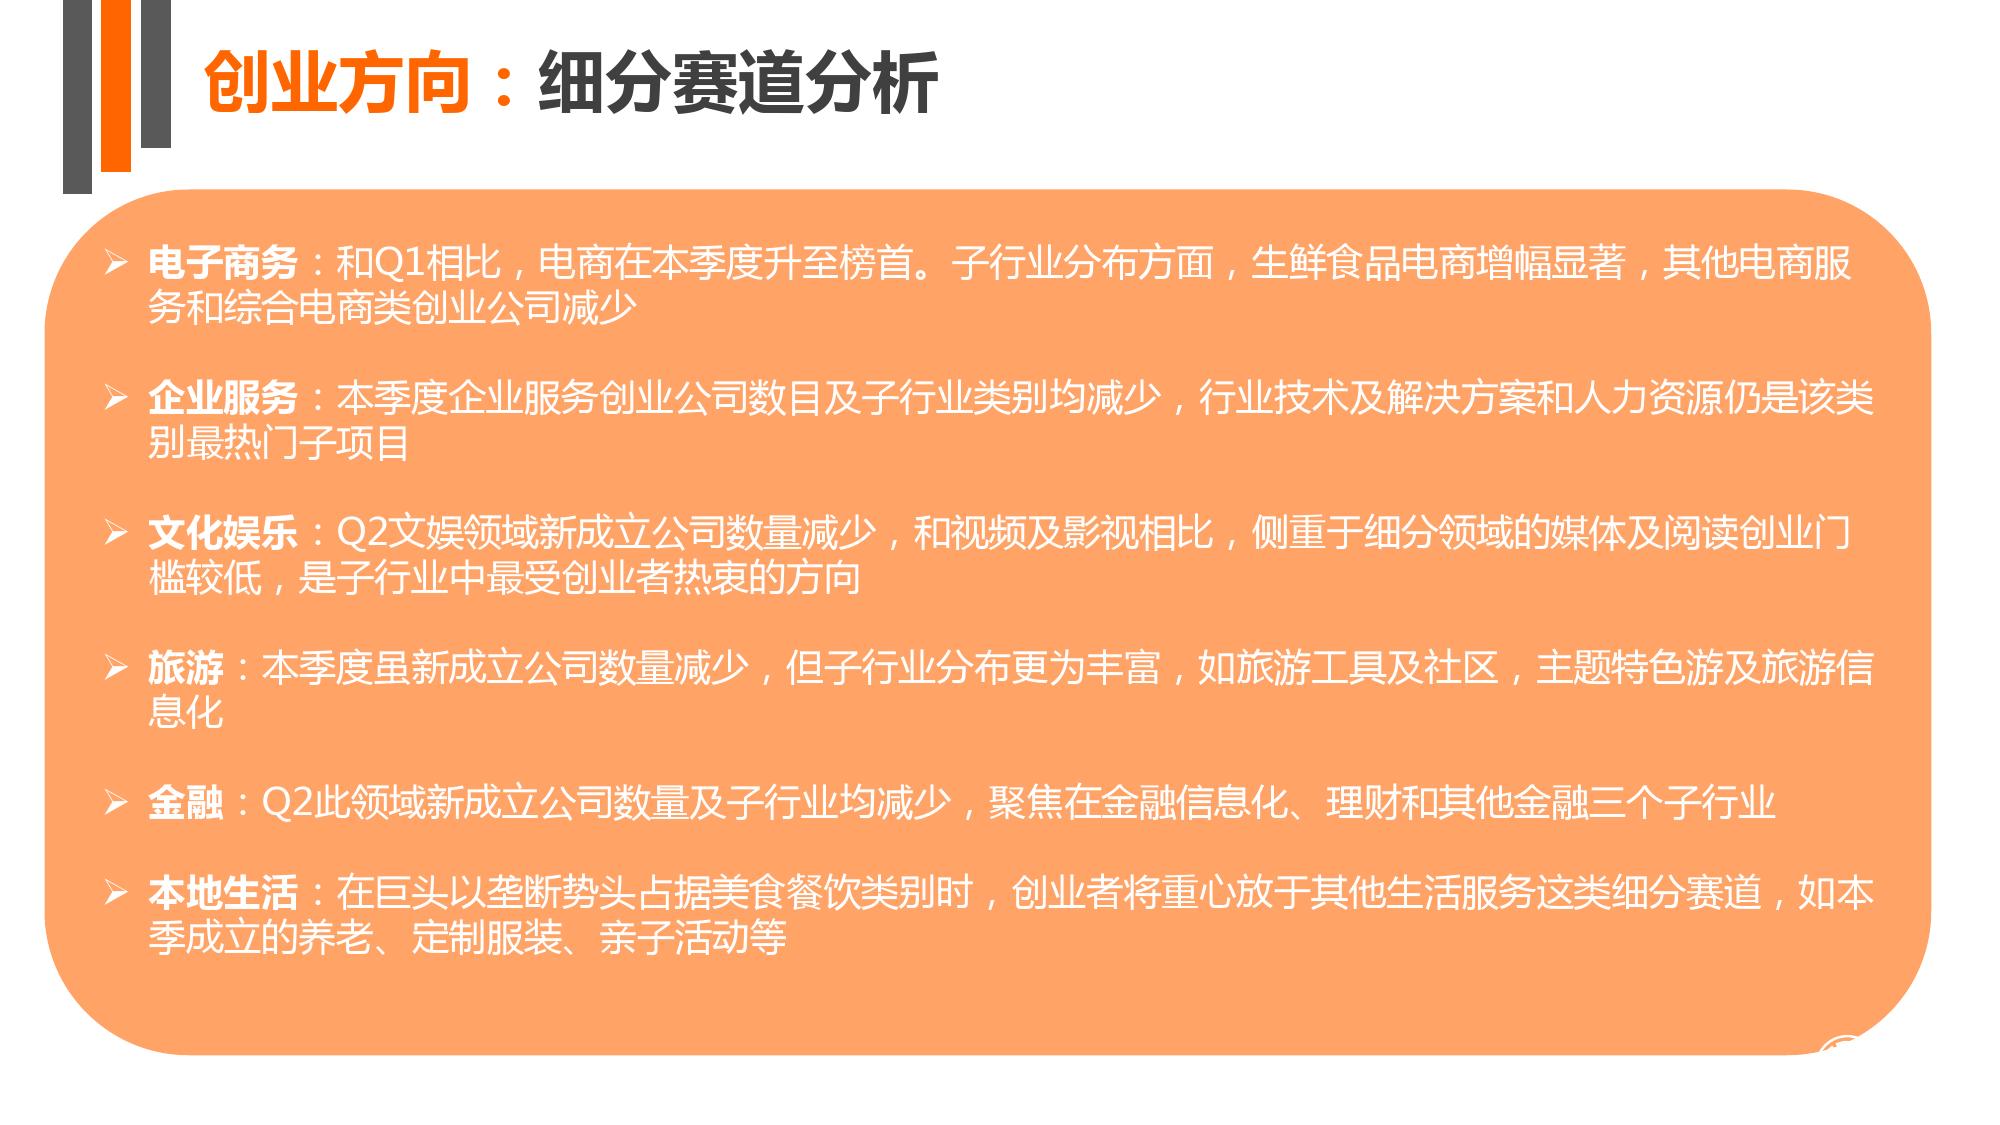 【IT桔子】2016年Q2中国互联网创业投资分析报告_000008